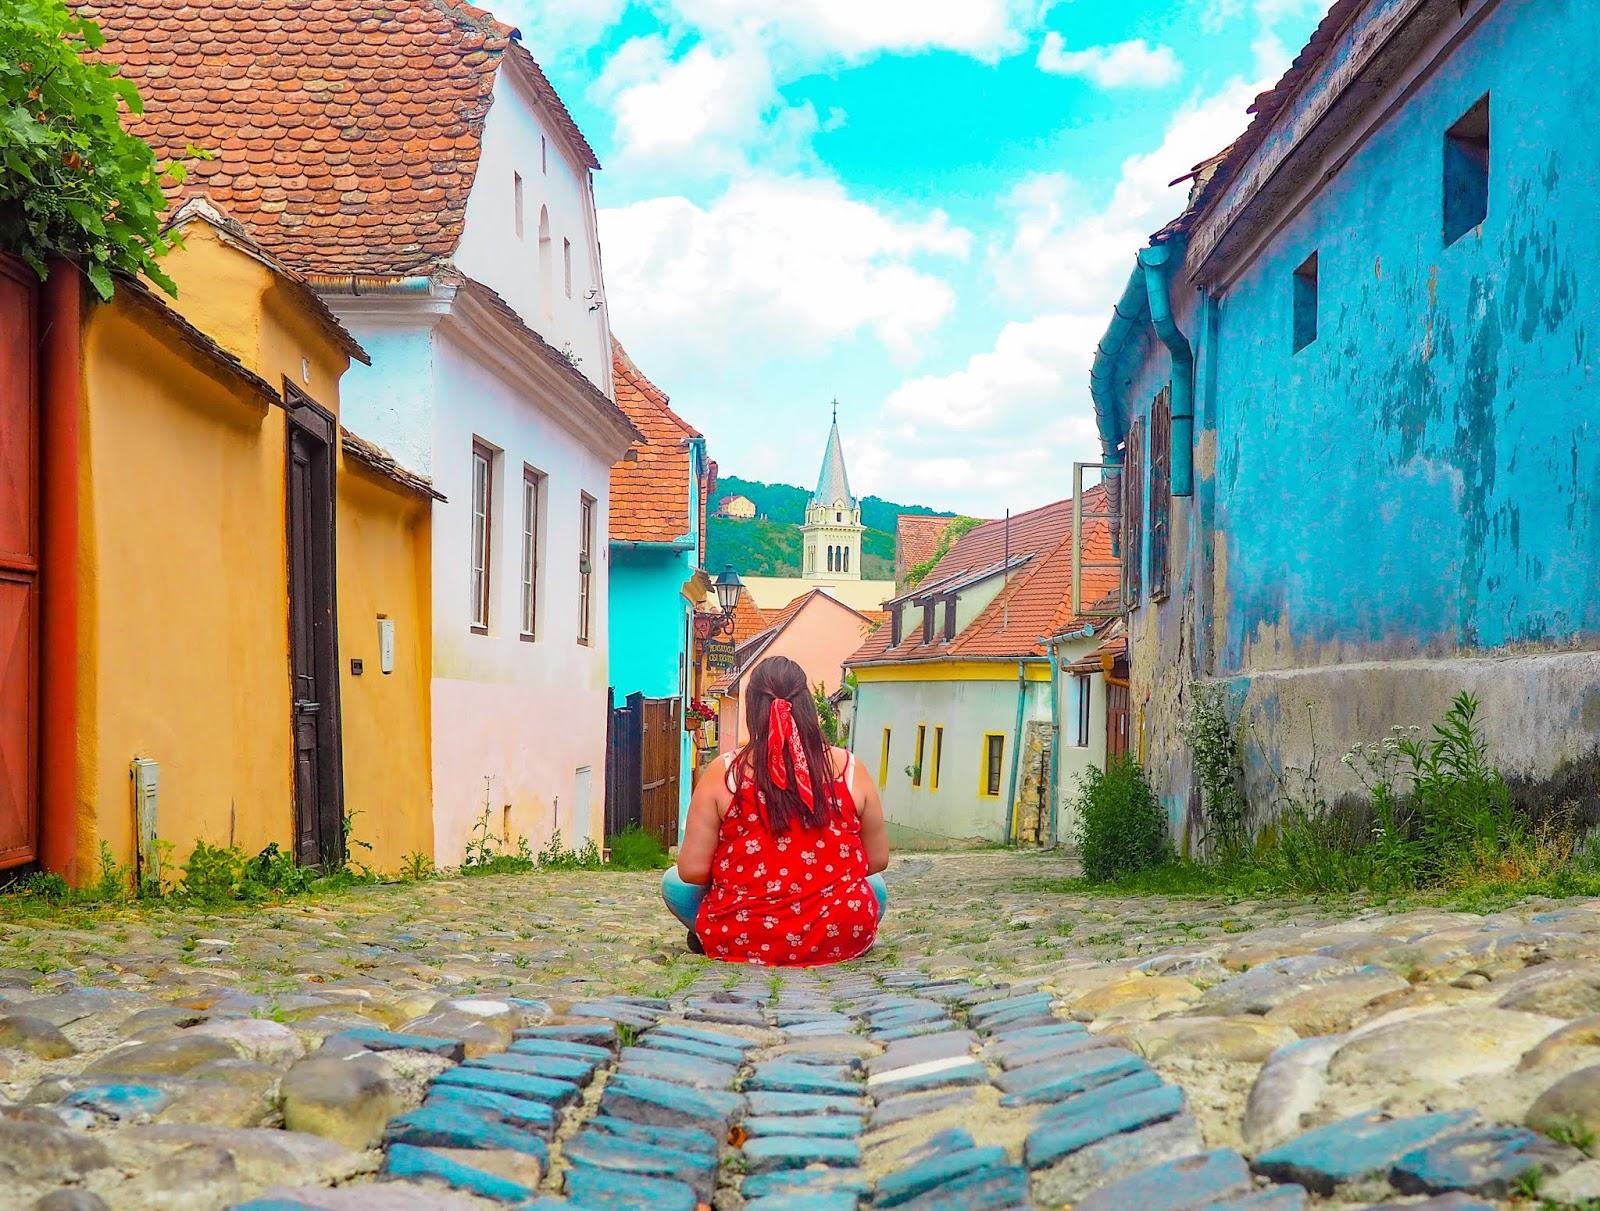 Swedish journalist goes beyond Romania's stereotypes ... |Romanian Men Stereotypes